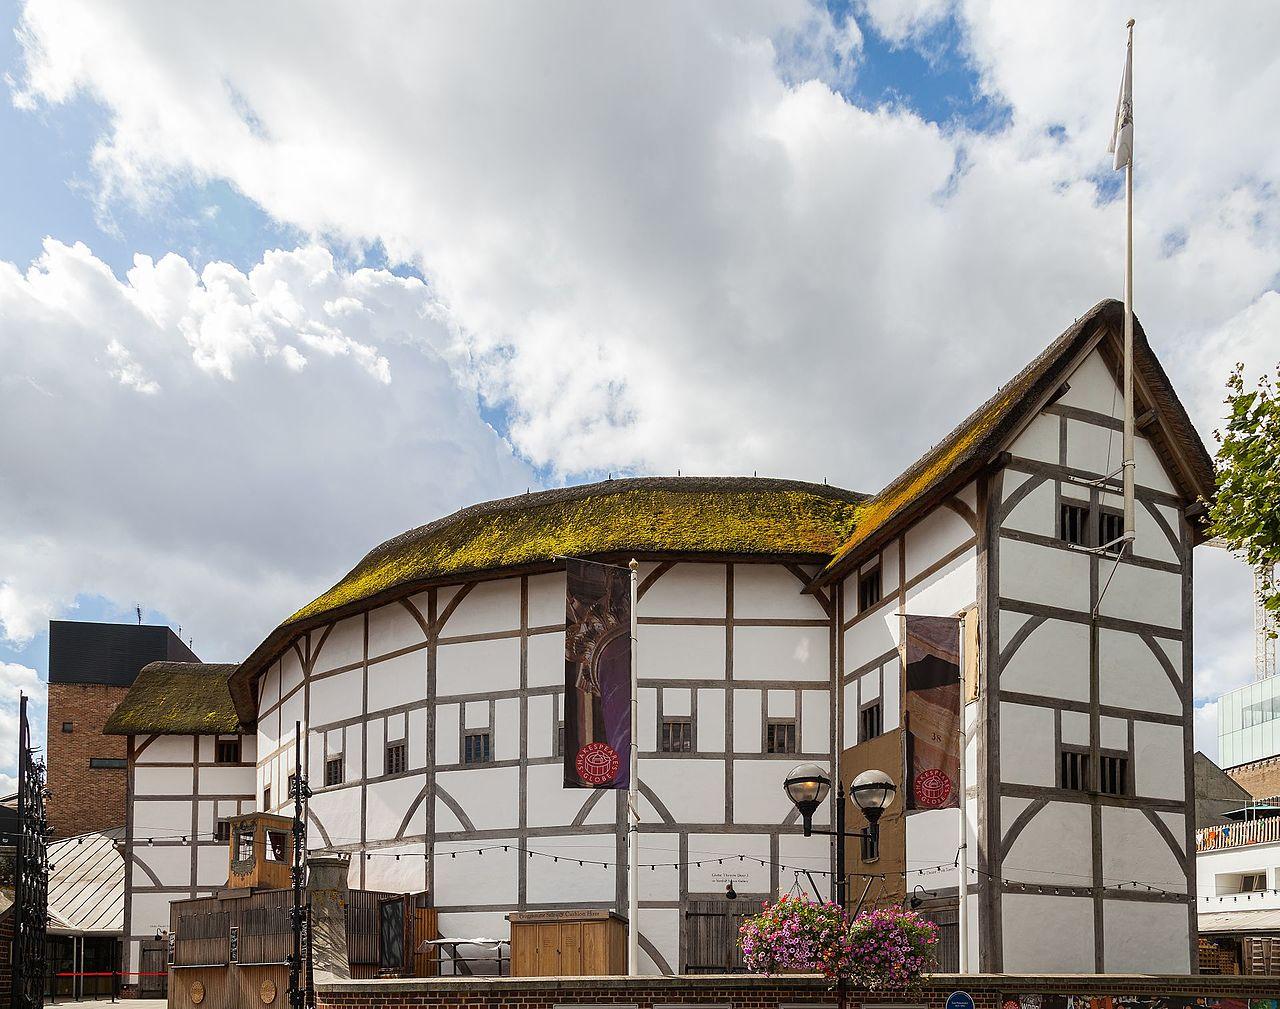 Globe Theatre, London, UK (Image)